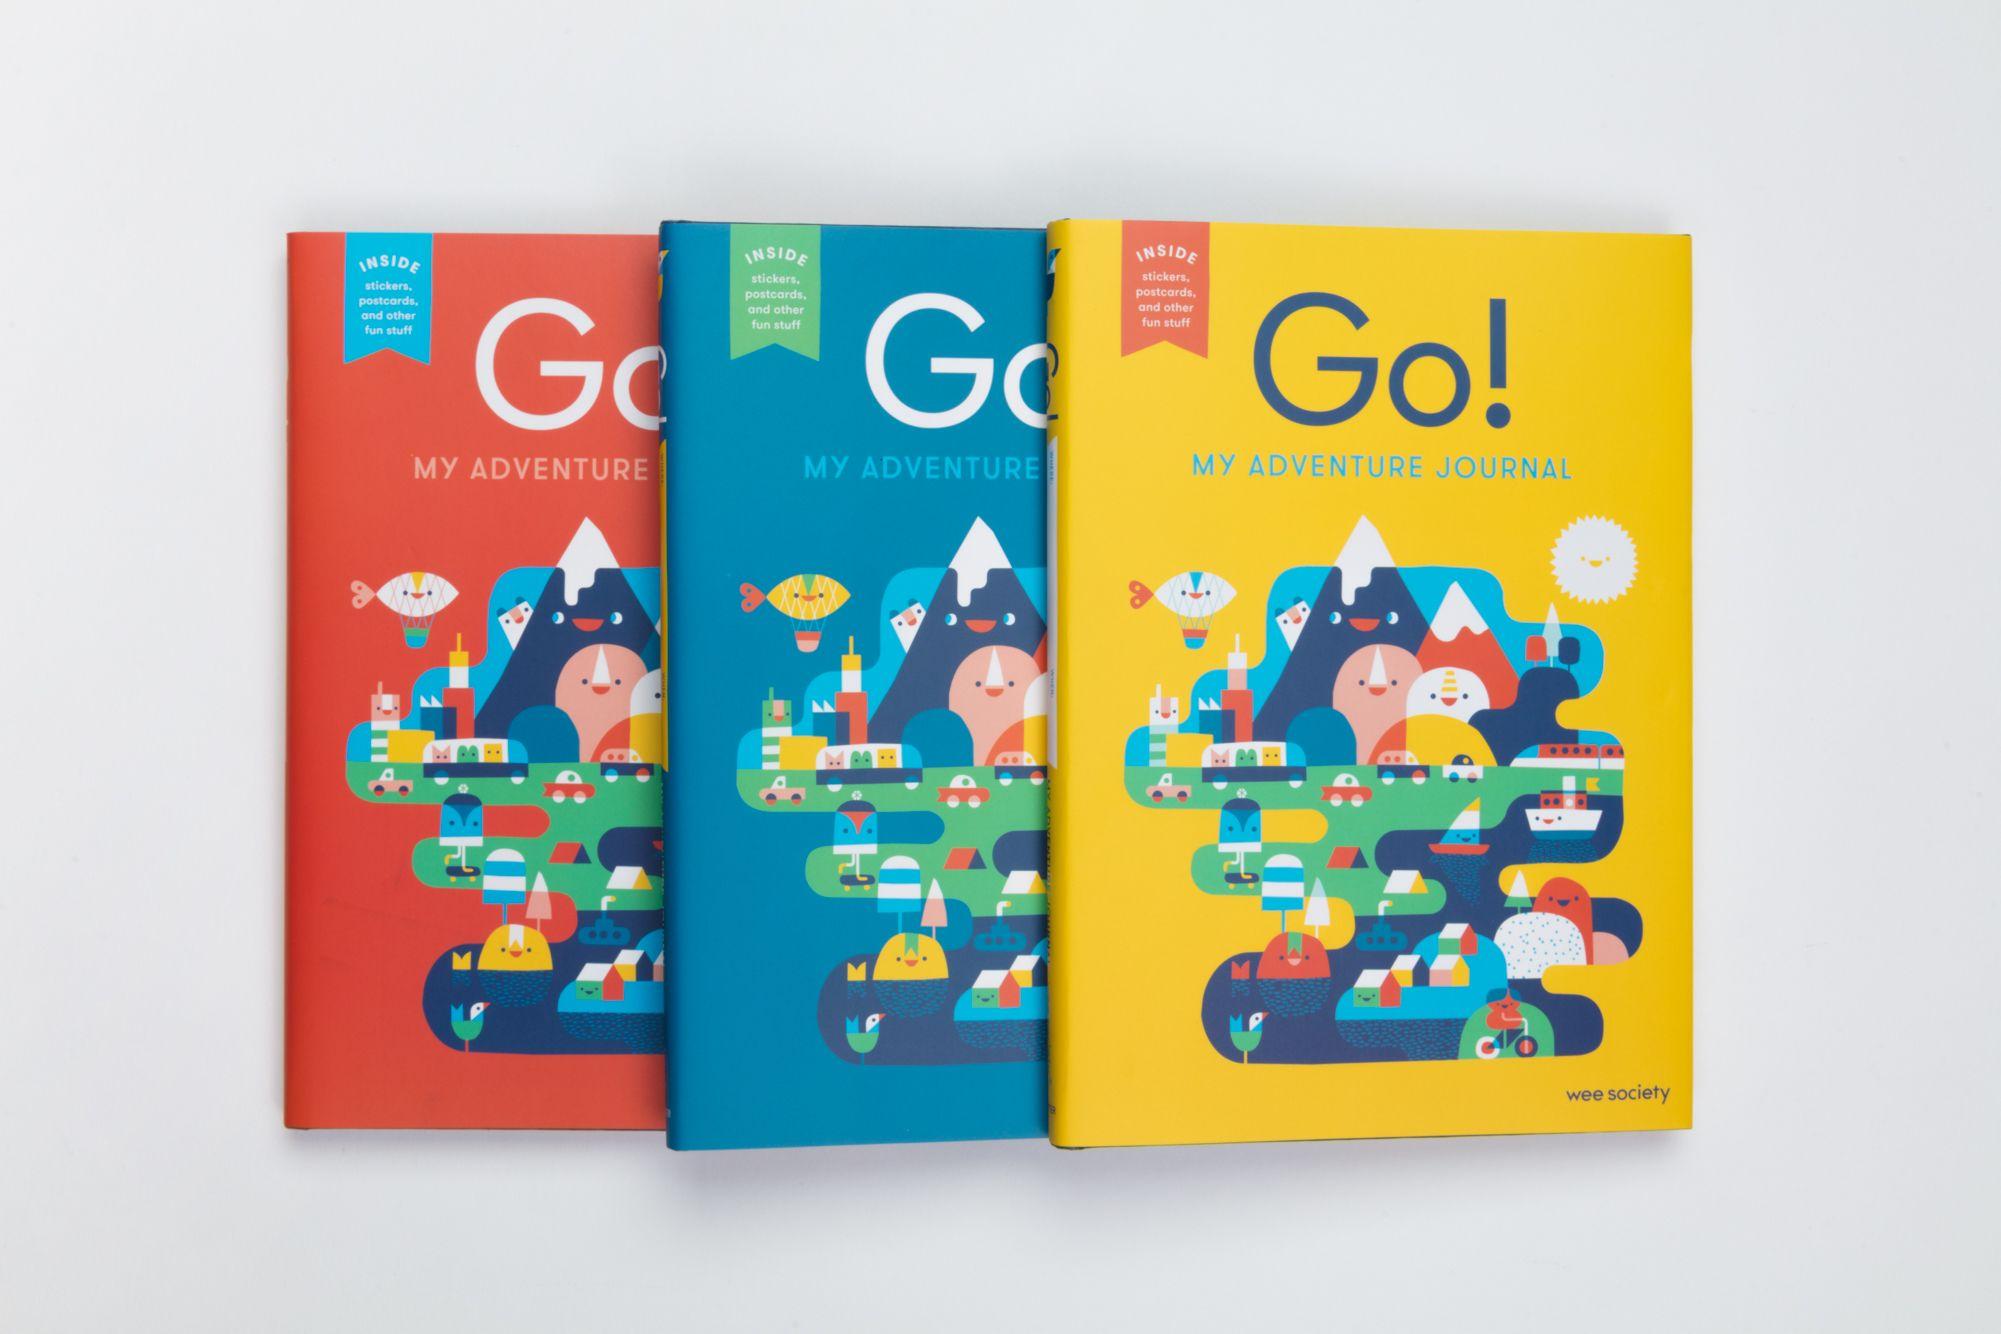 Go Red By Wee Society 9781524763022 Penguinrandomhouse Com Books Book Design Kids Activity Books Booklet Design